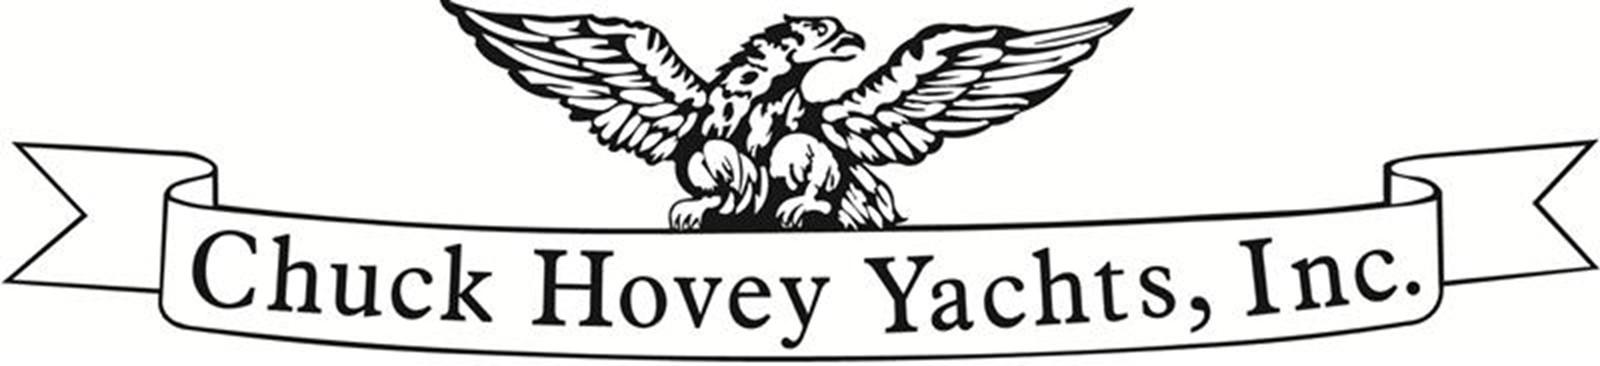 Chuck Hovey Yachts, Inc.